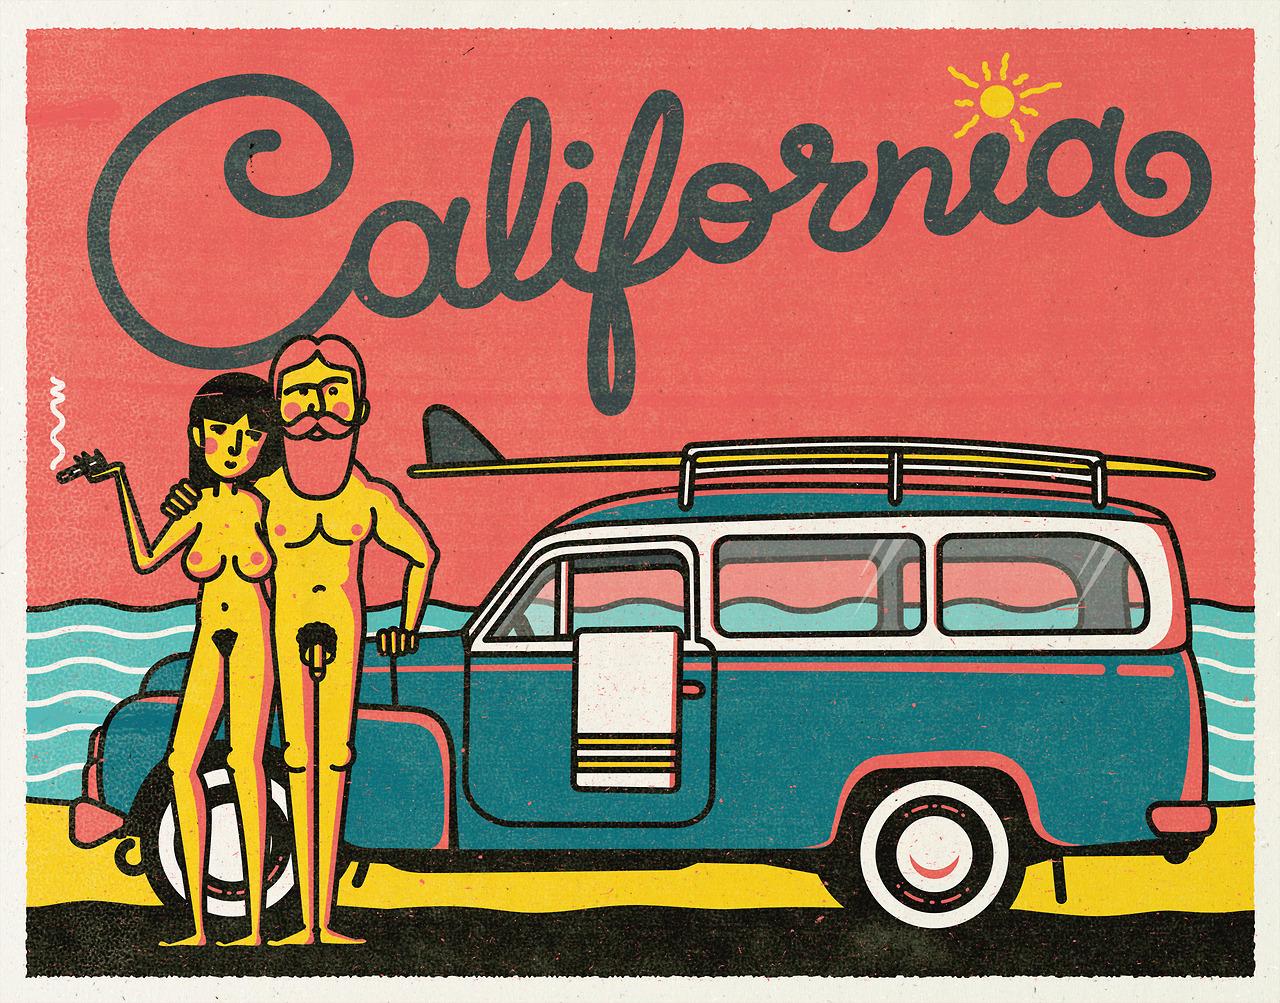 Hell Yeah California